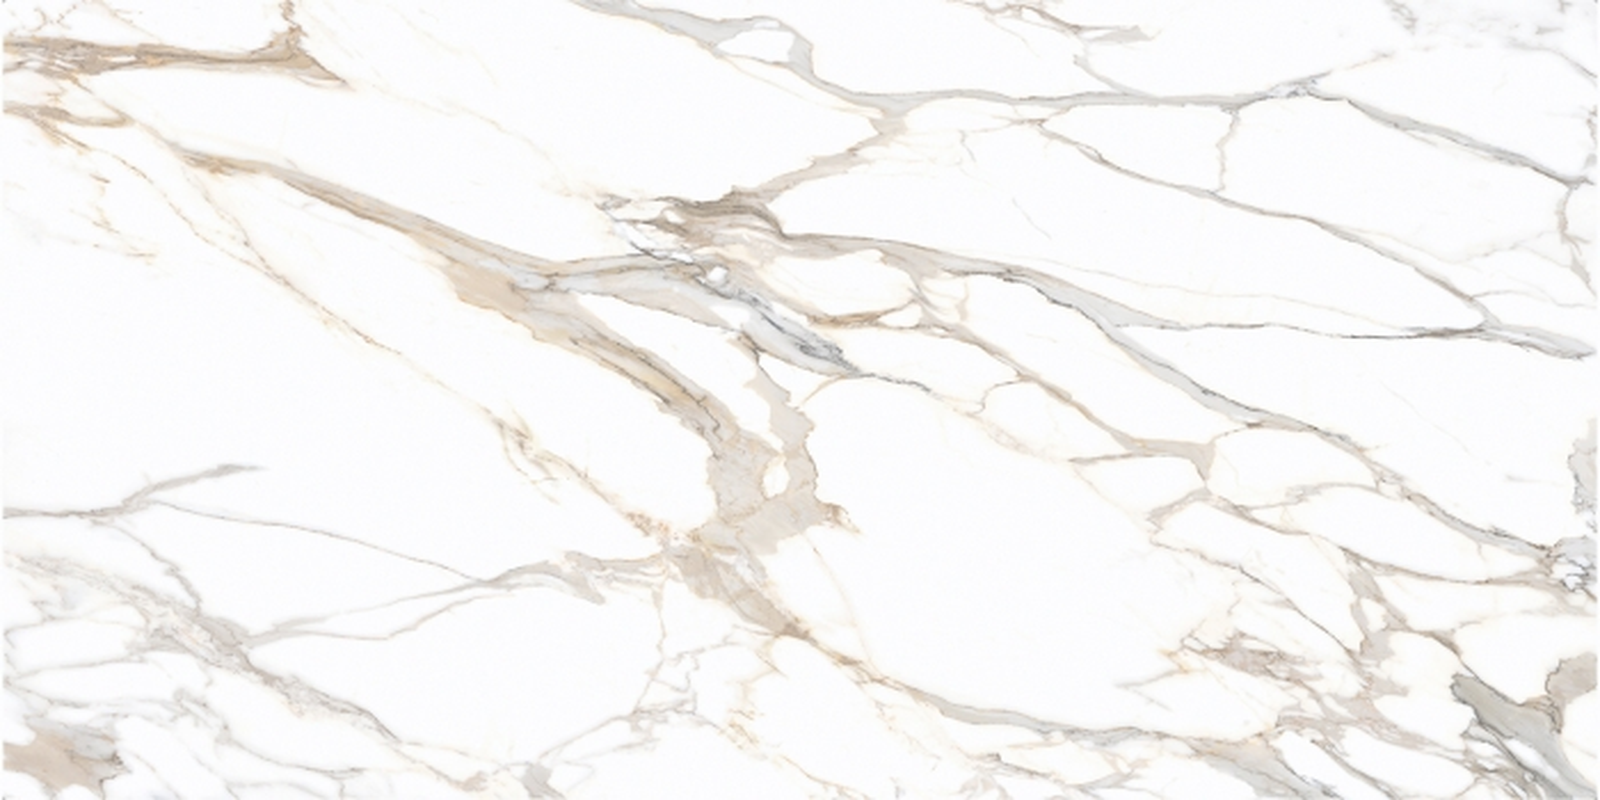 CALACATTA SUPREME Supply California (United States of America) polished slabs CSP , Std Size heat resistant porcelain stoneware